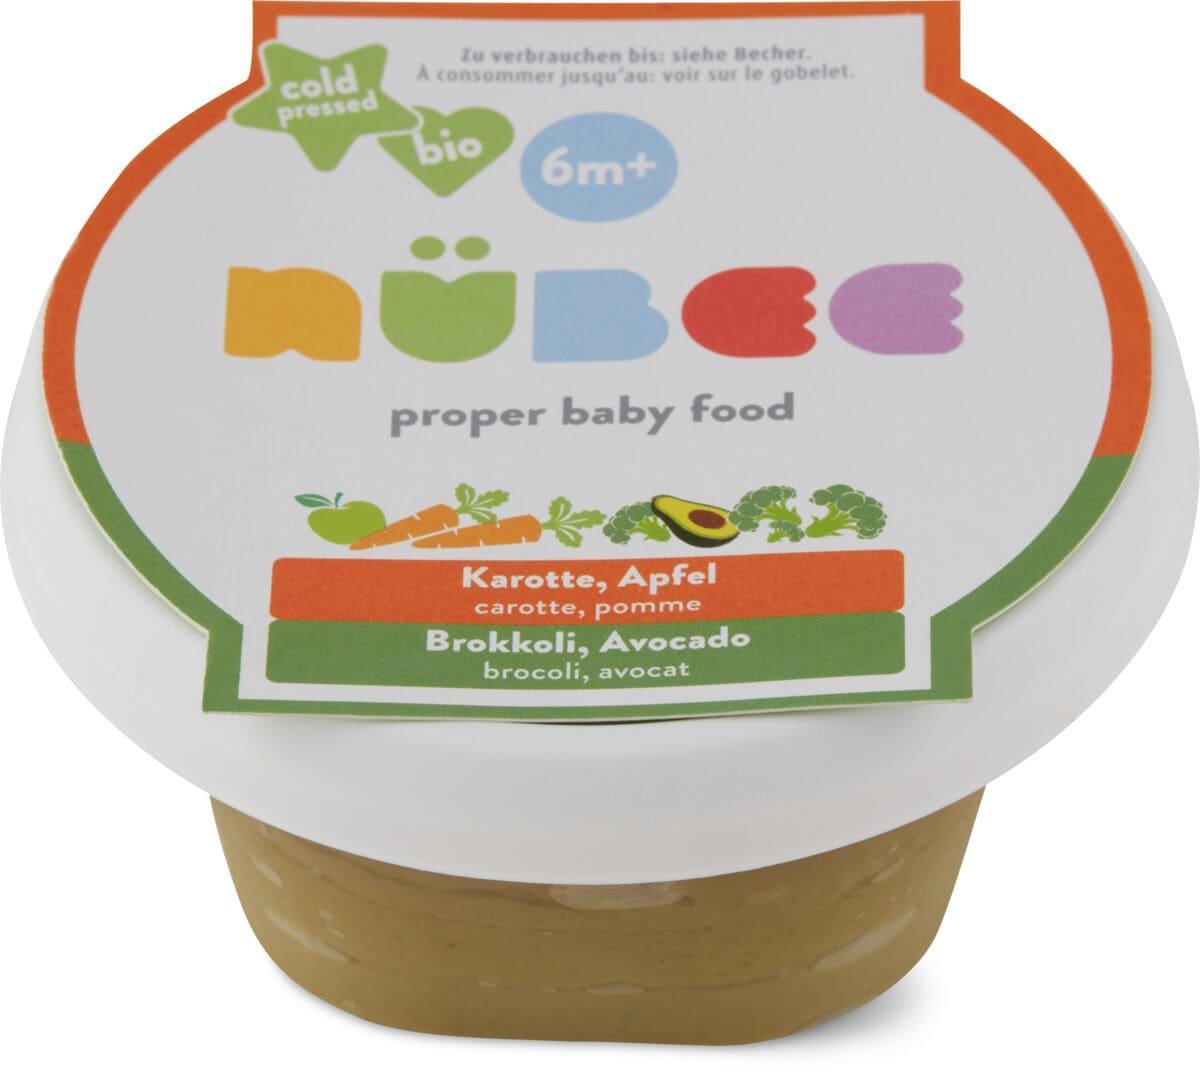 Nübee carota, mela broccoli, avocado